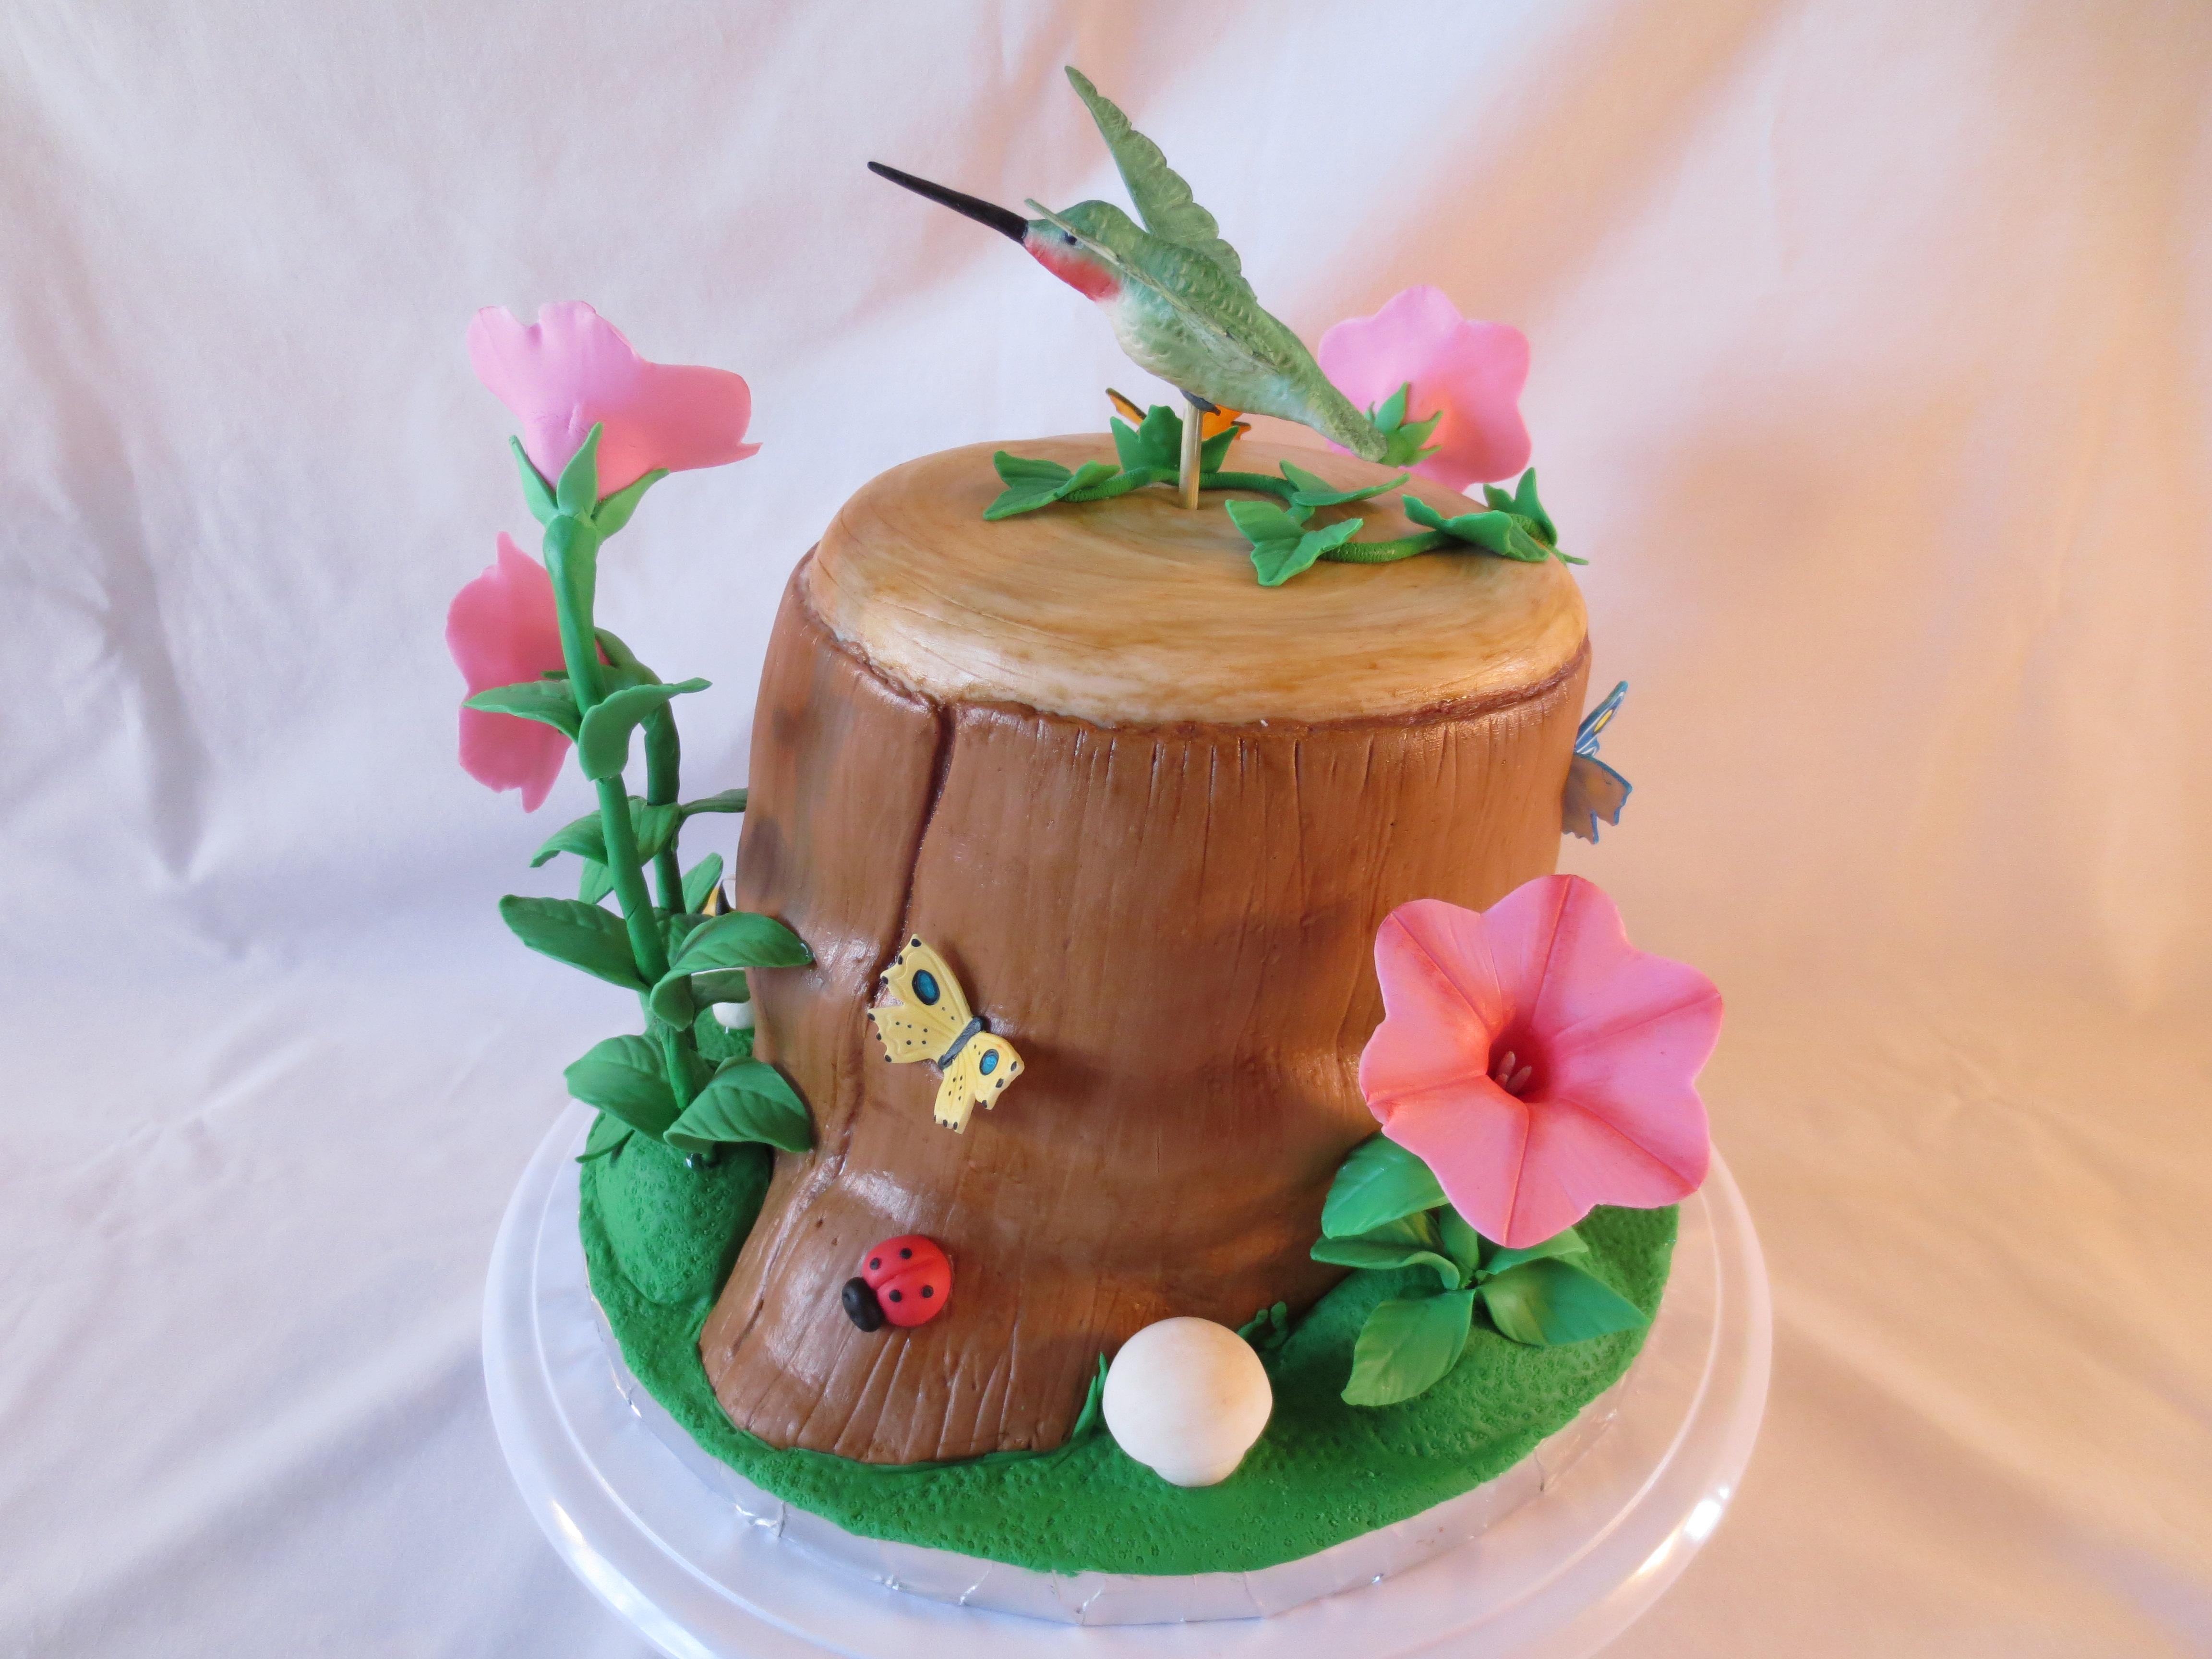 Vegan Gluten Free Hummingbird Cake